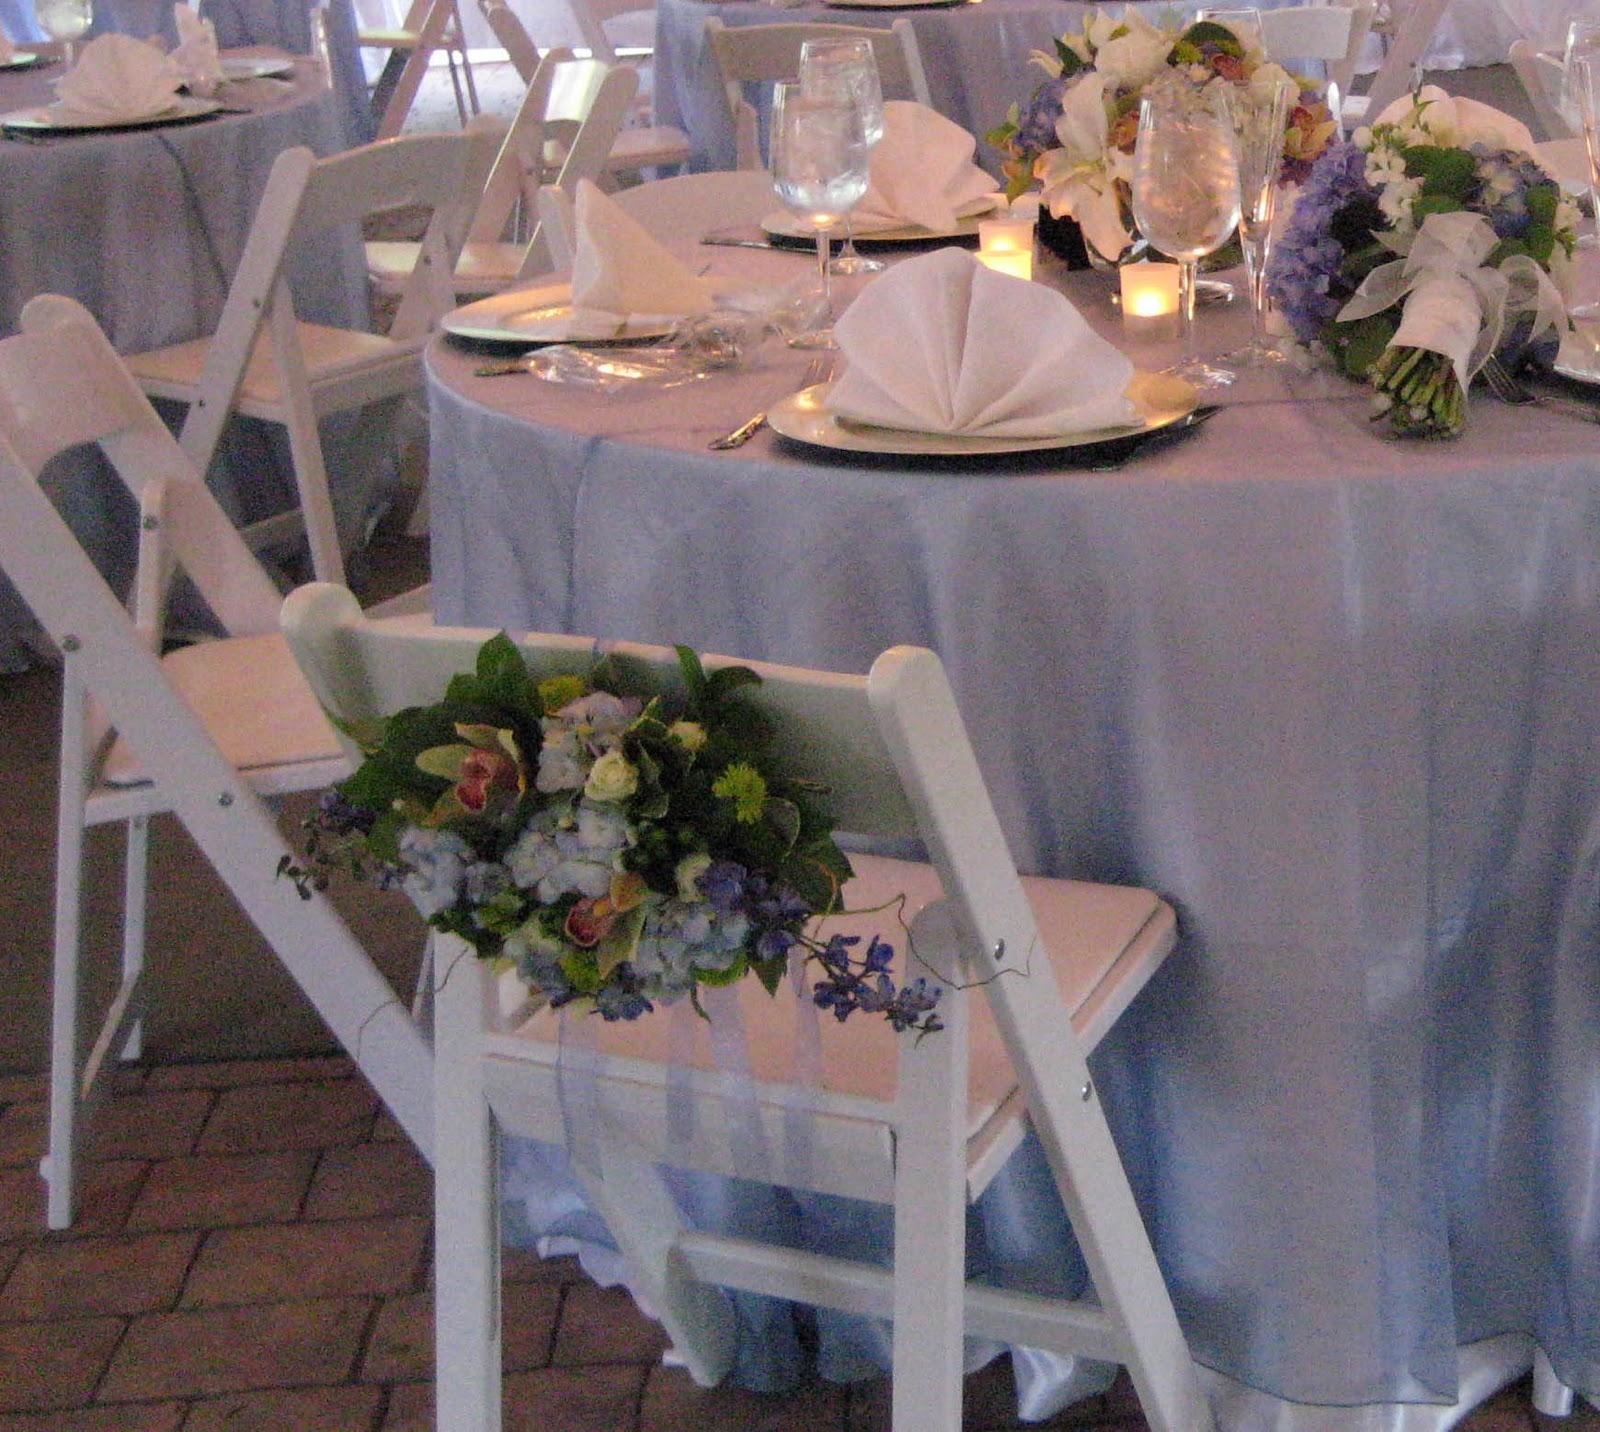 Wedding Chapel Decoration Ideas: Weddings On Wirt Street: Wedding Ceremony Chair Decorations